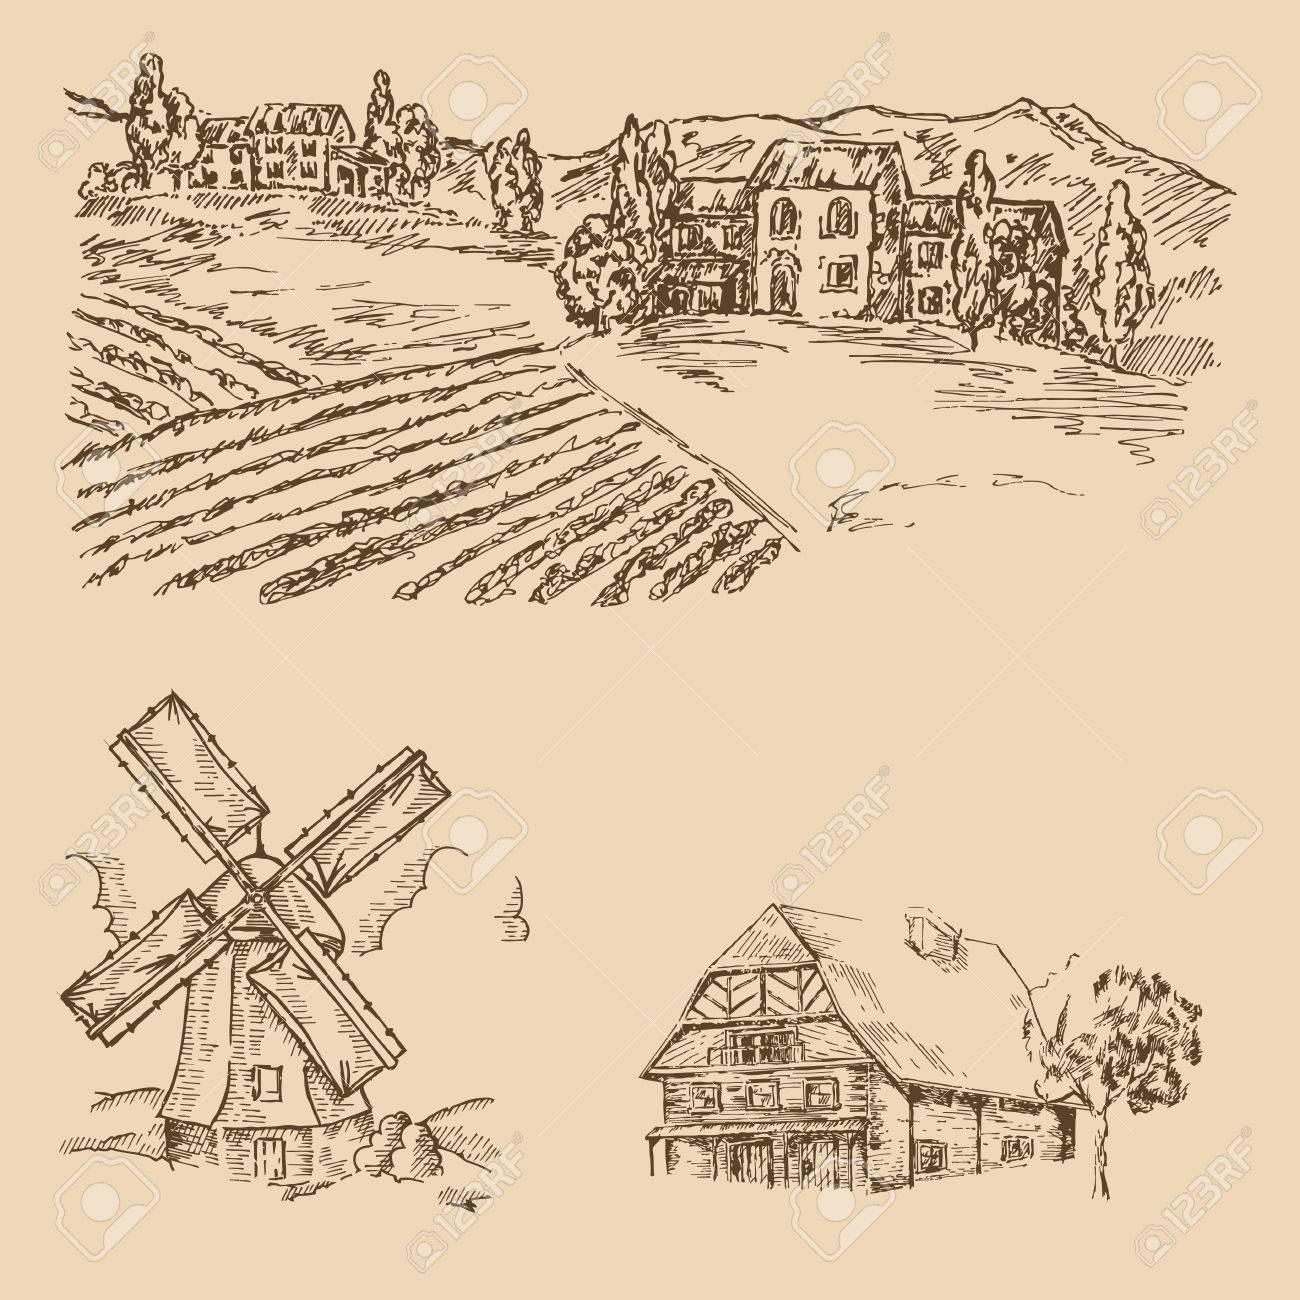 1300x1300 Rural Landscape. Hand Drawn Vineyard, Farm House And Windmill